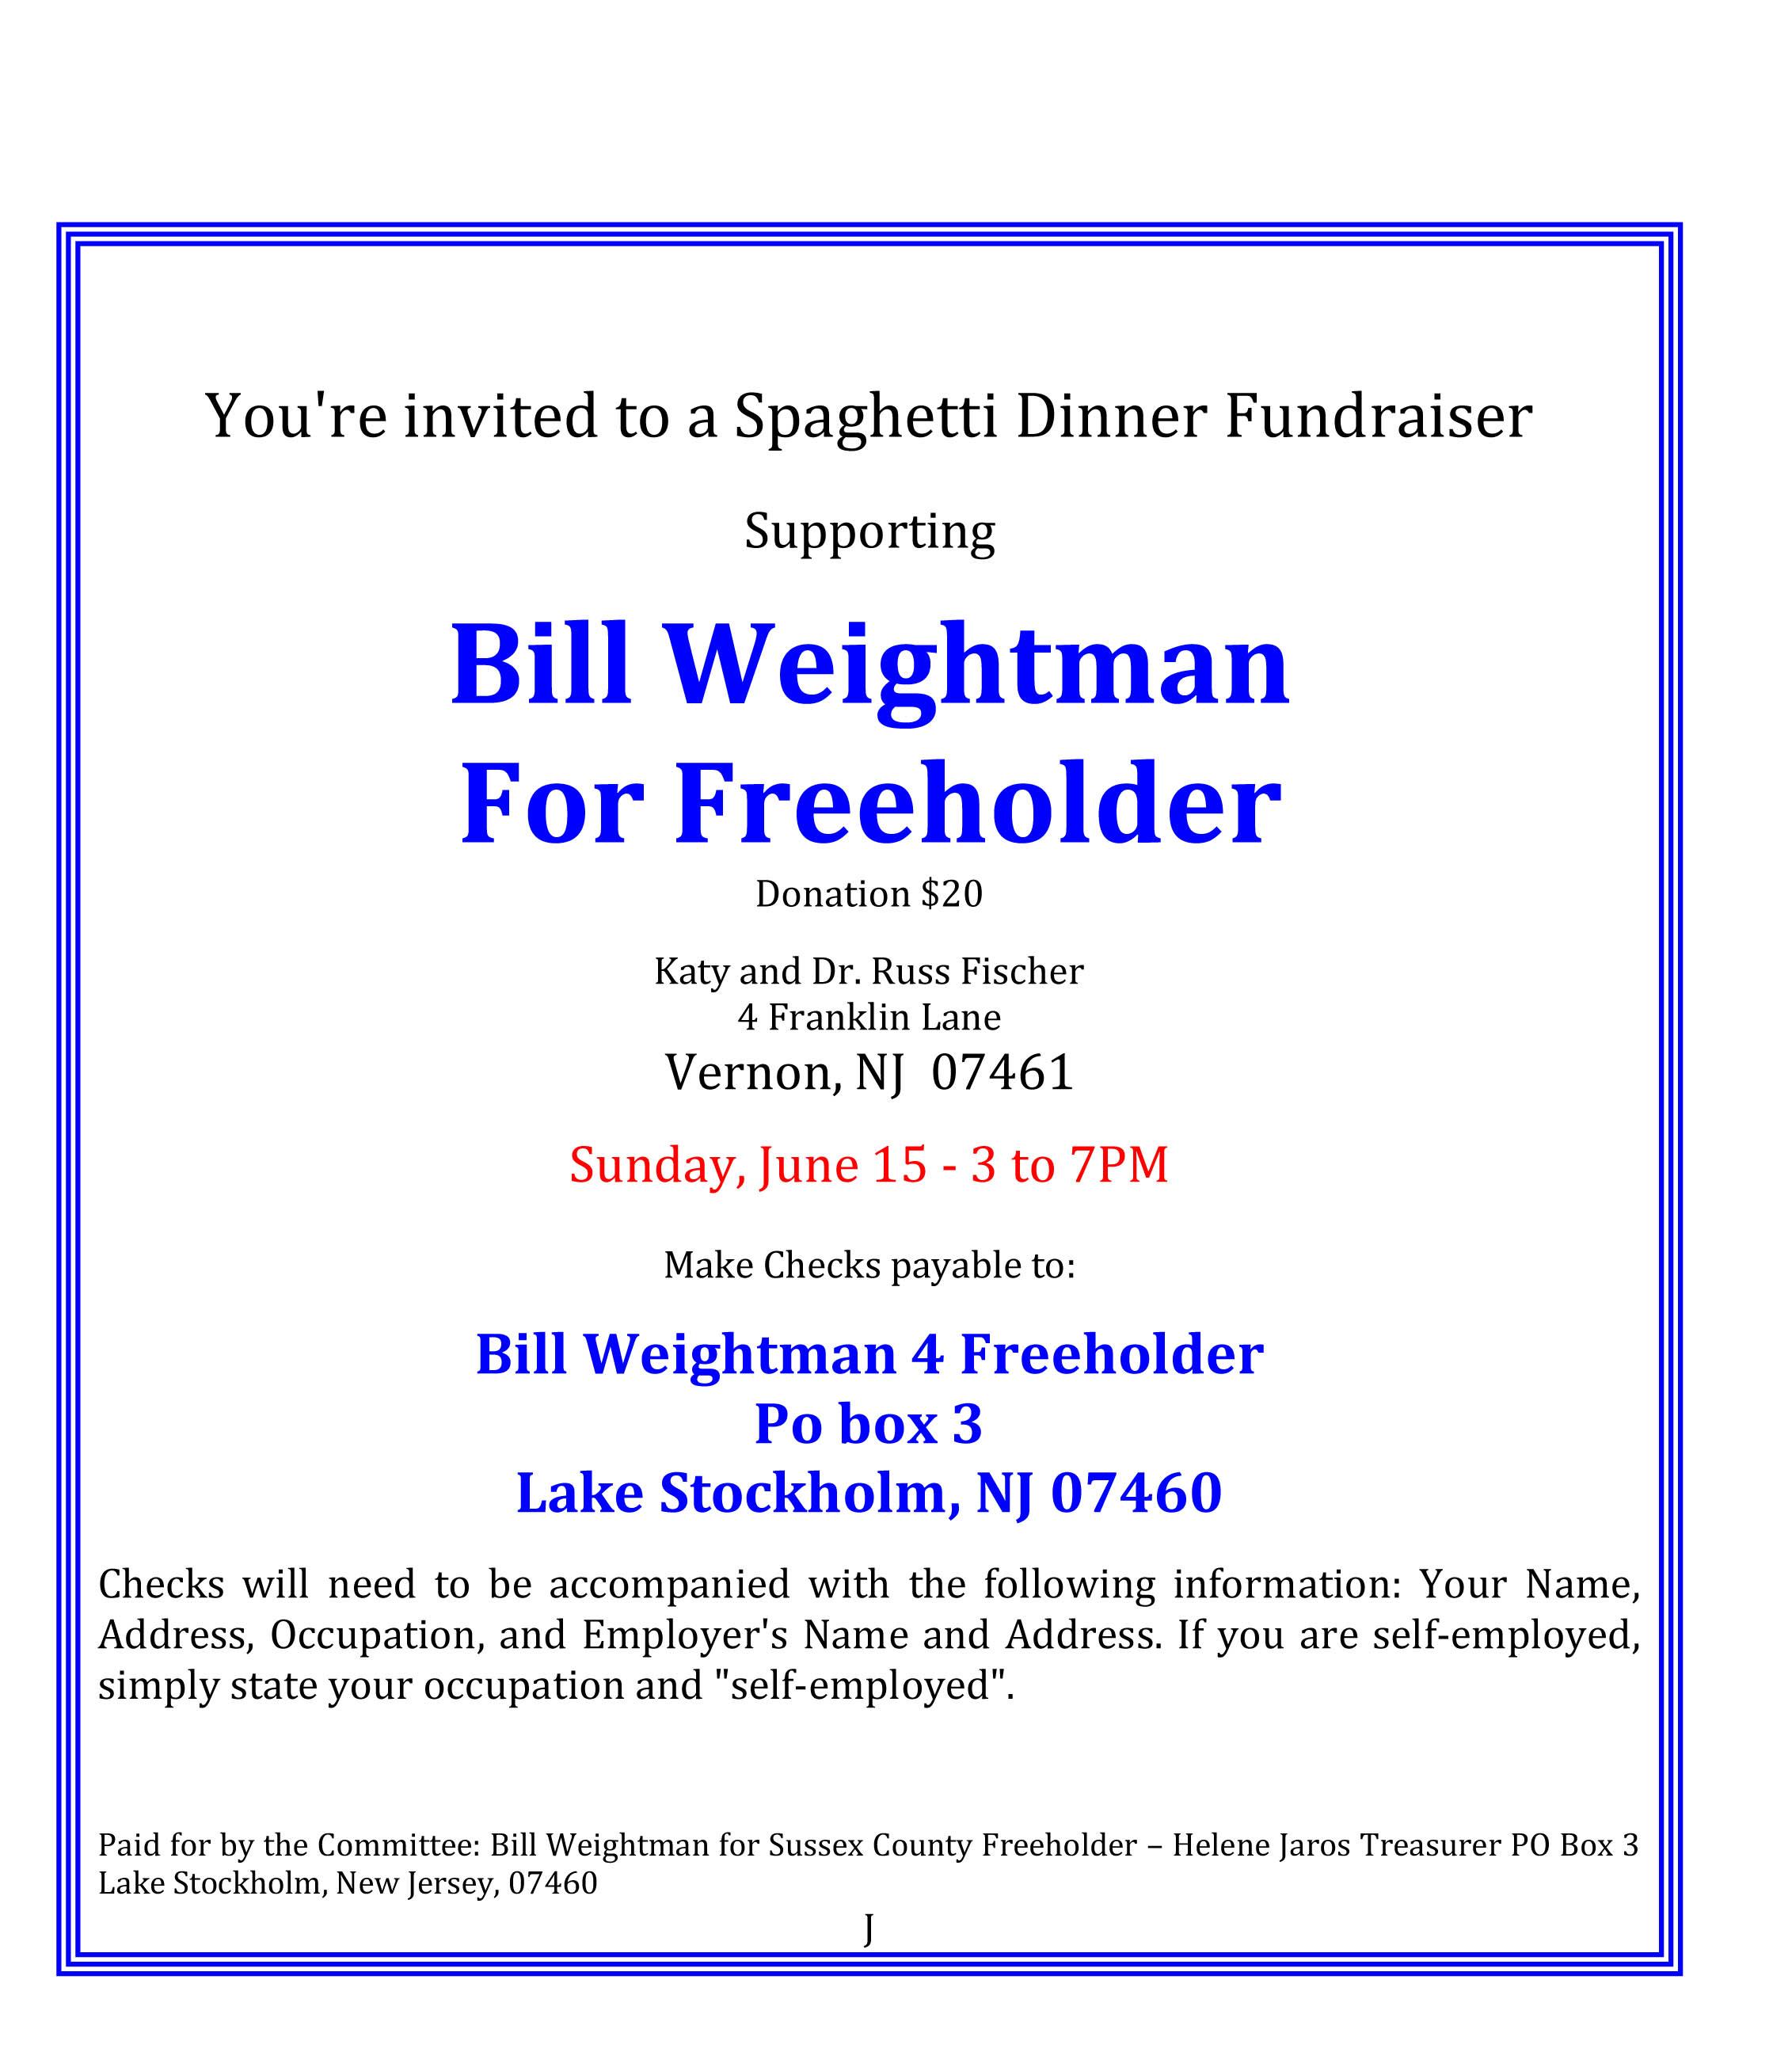 weightman-spaghettidinner.jpg